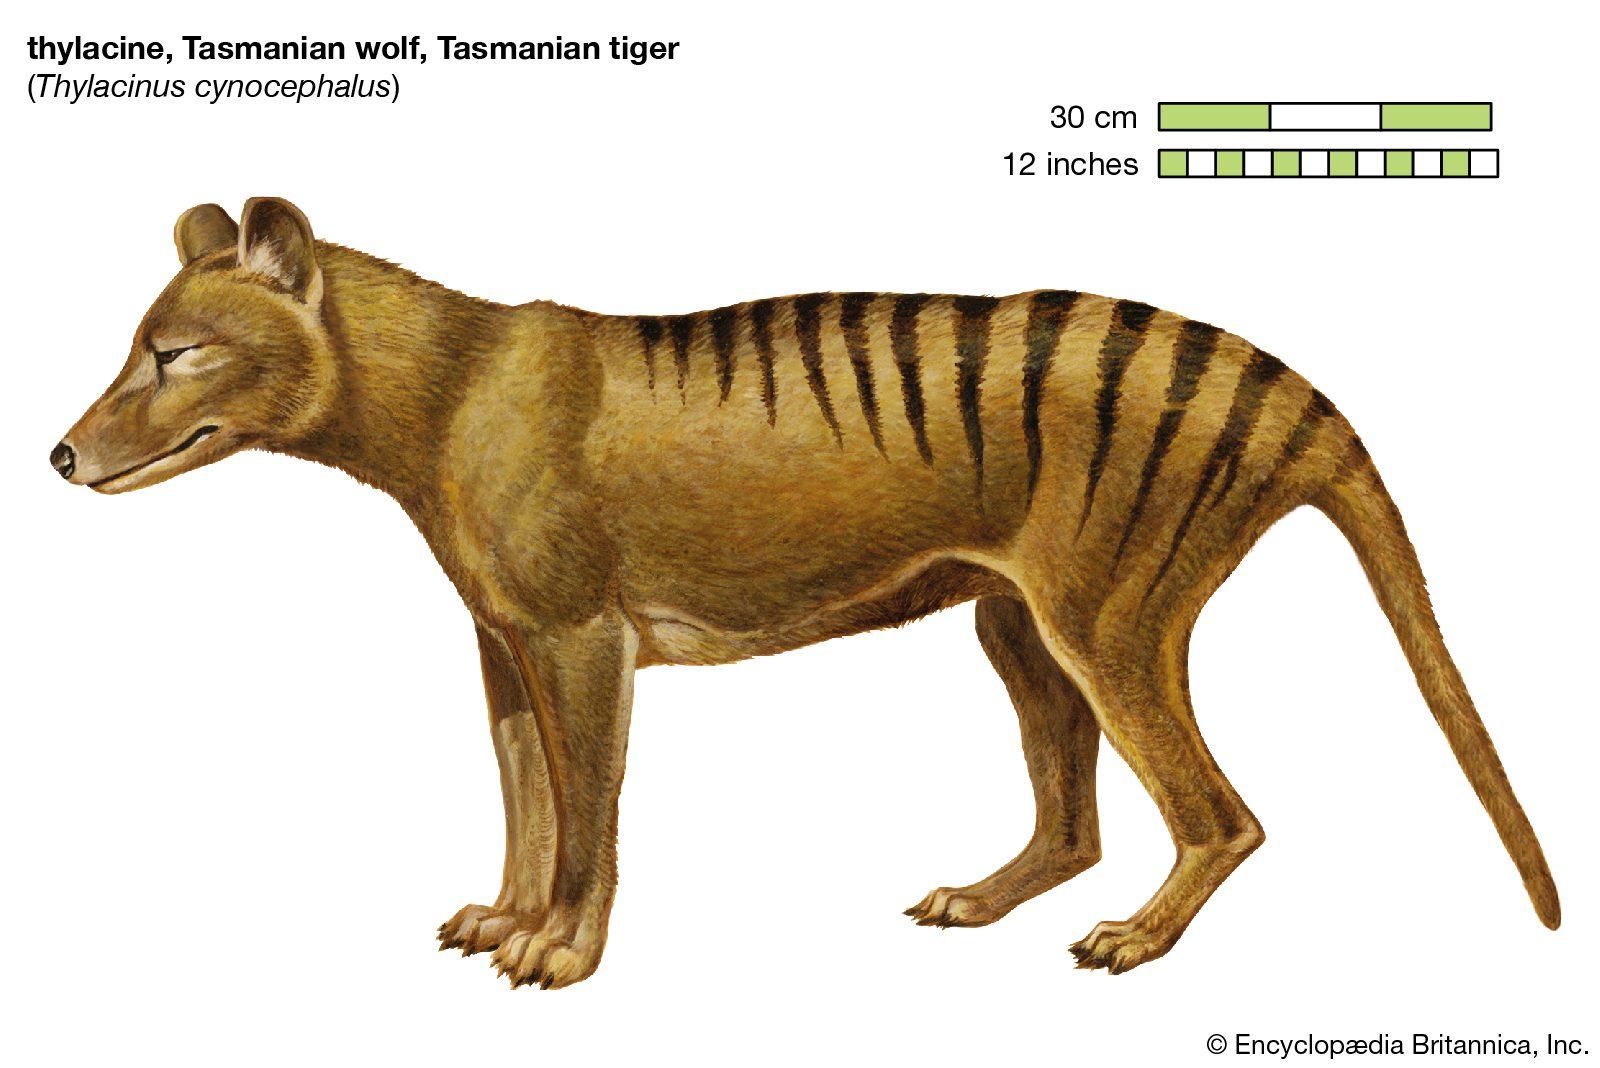 tiger tasmanian marsupial thylacine wolf island australia